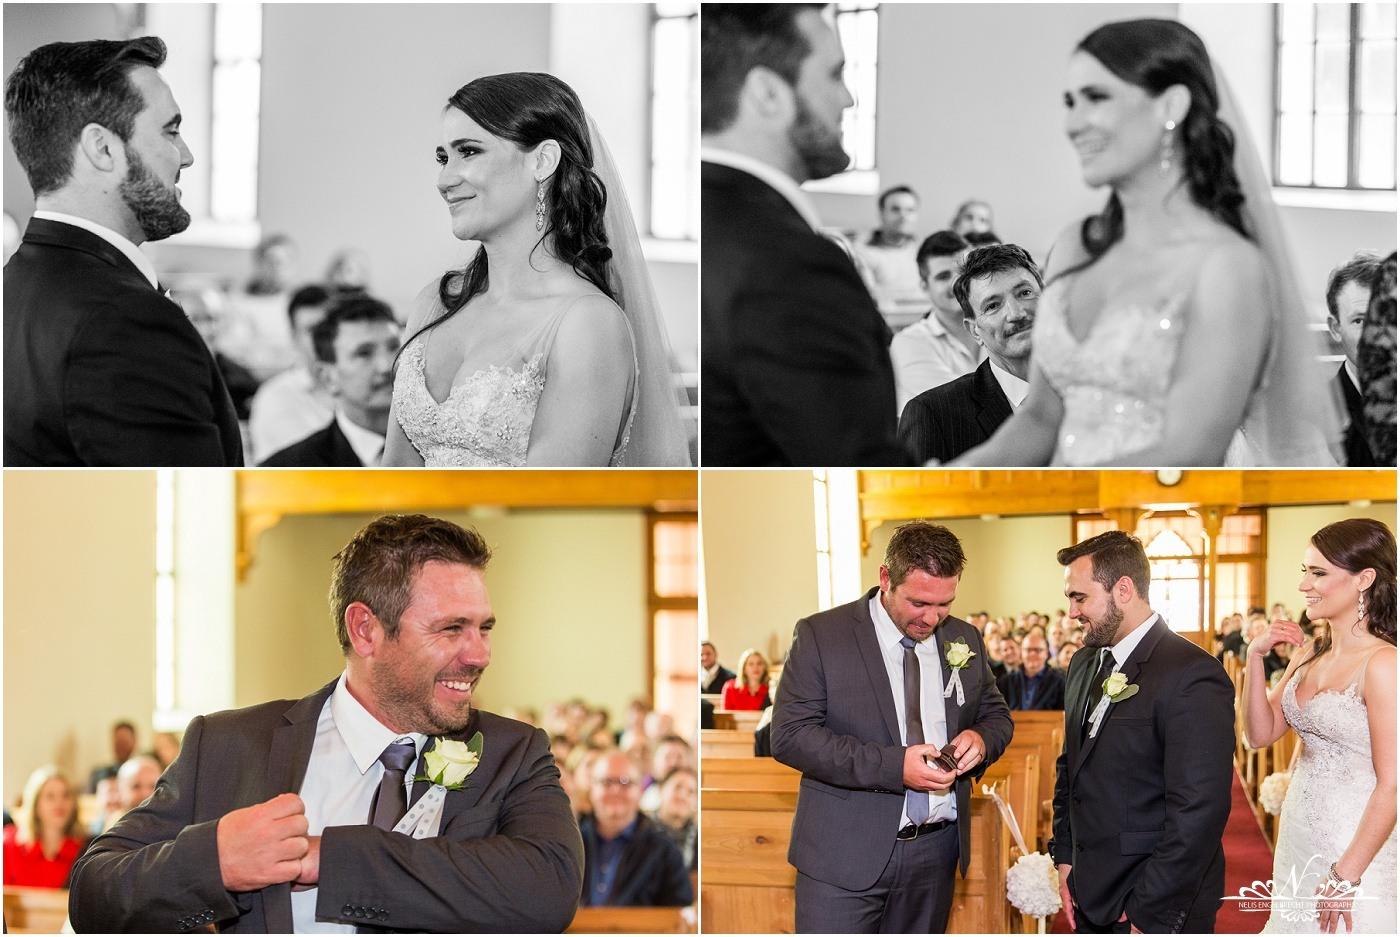 Eensgezind-Wedding-Photos-Nelis-Engelbrecht-Photography-064